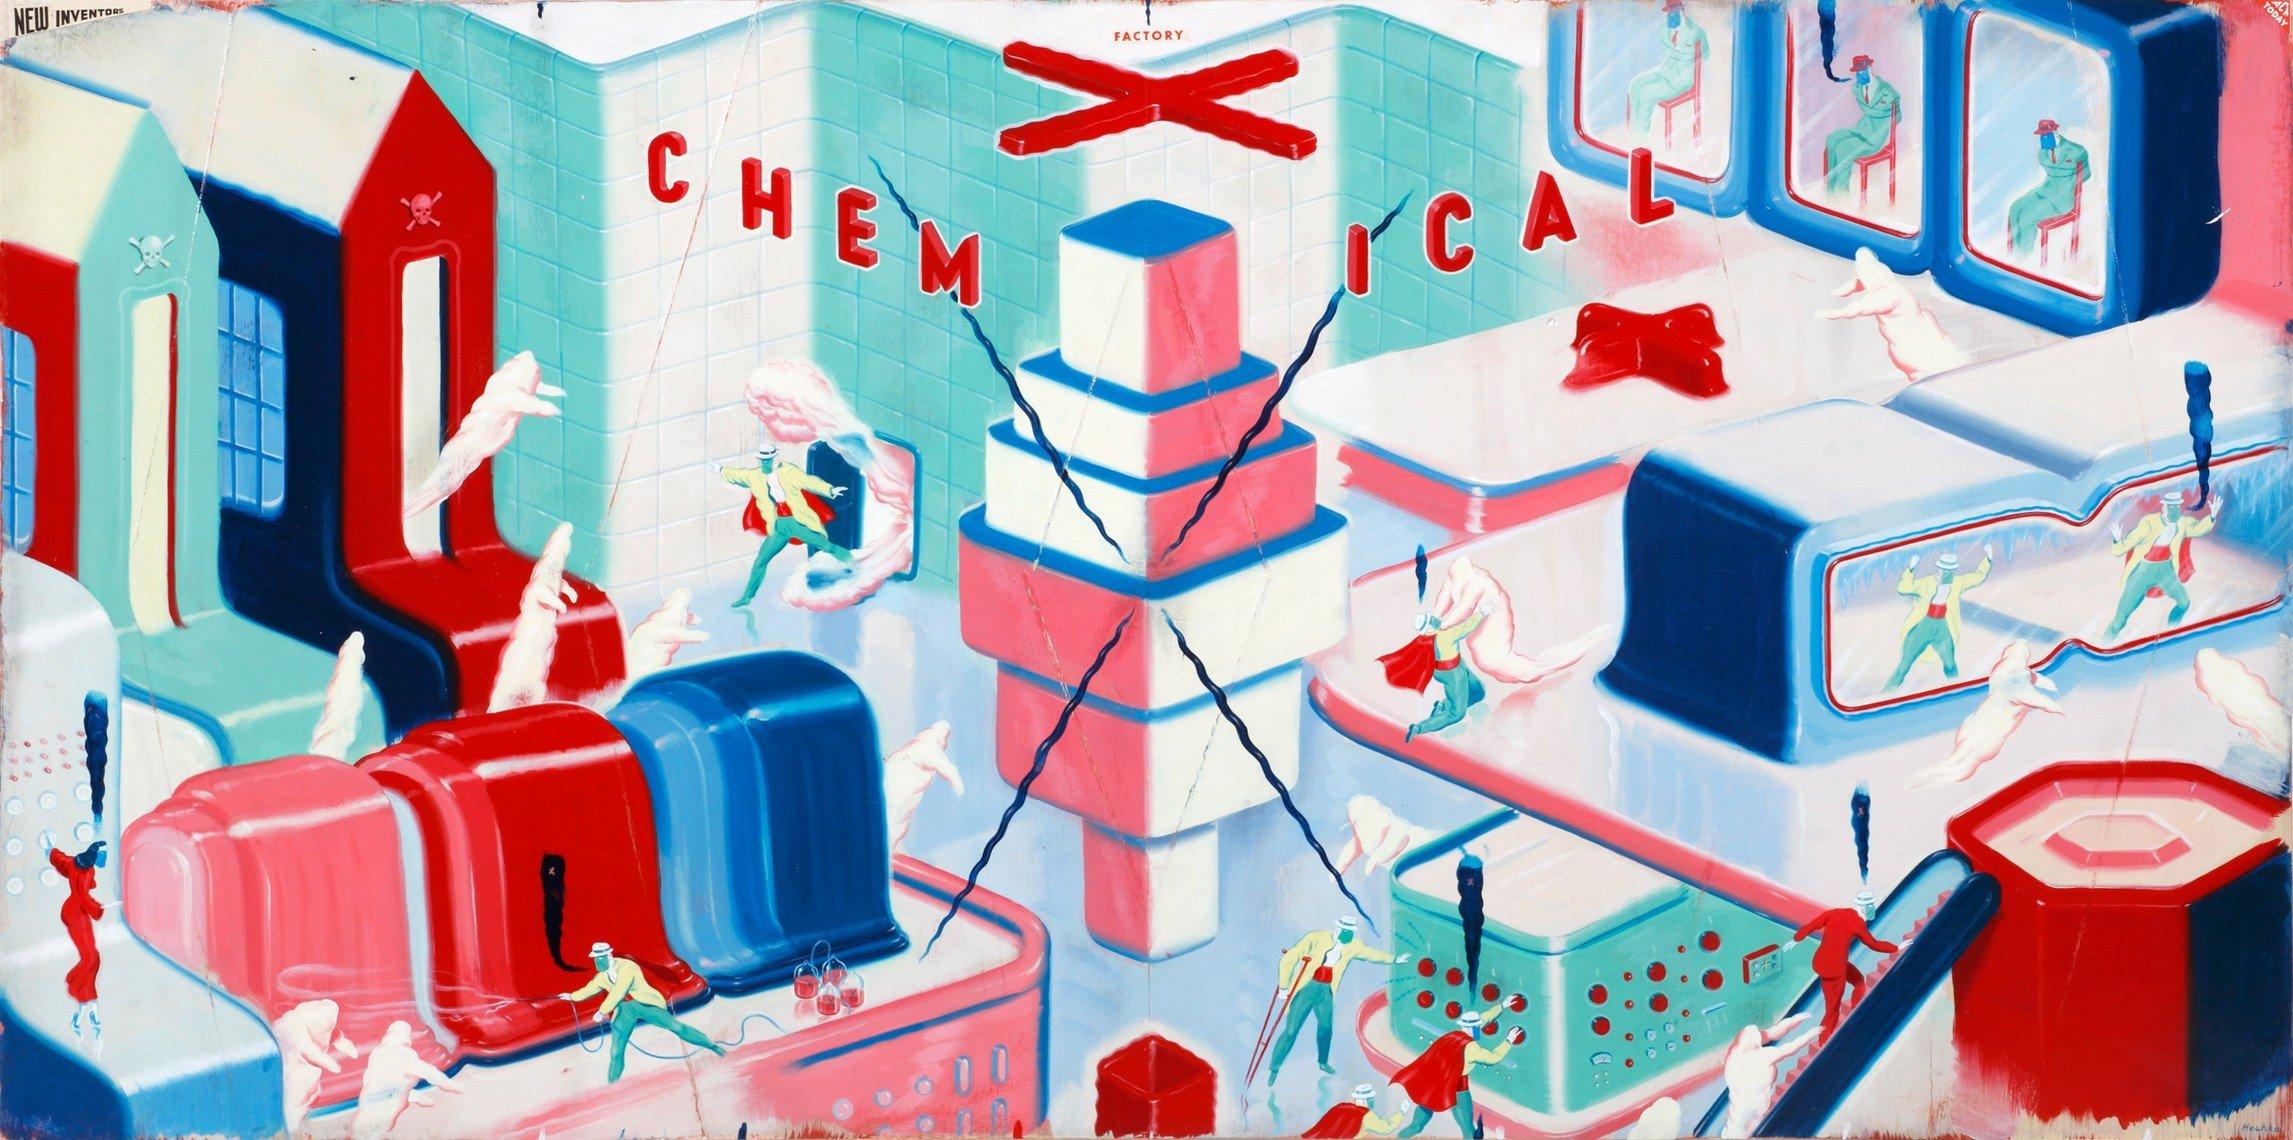 Ryan Heshka - Chemical X Factory